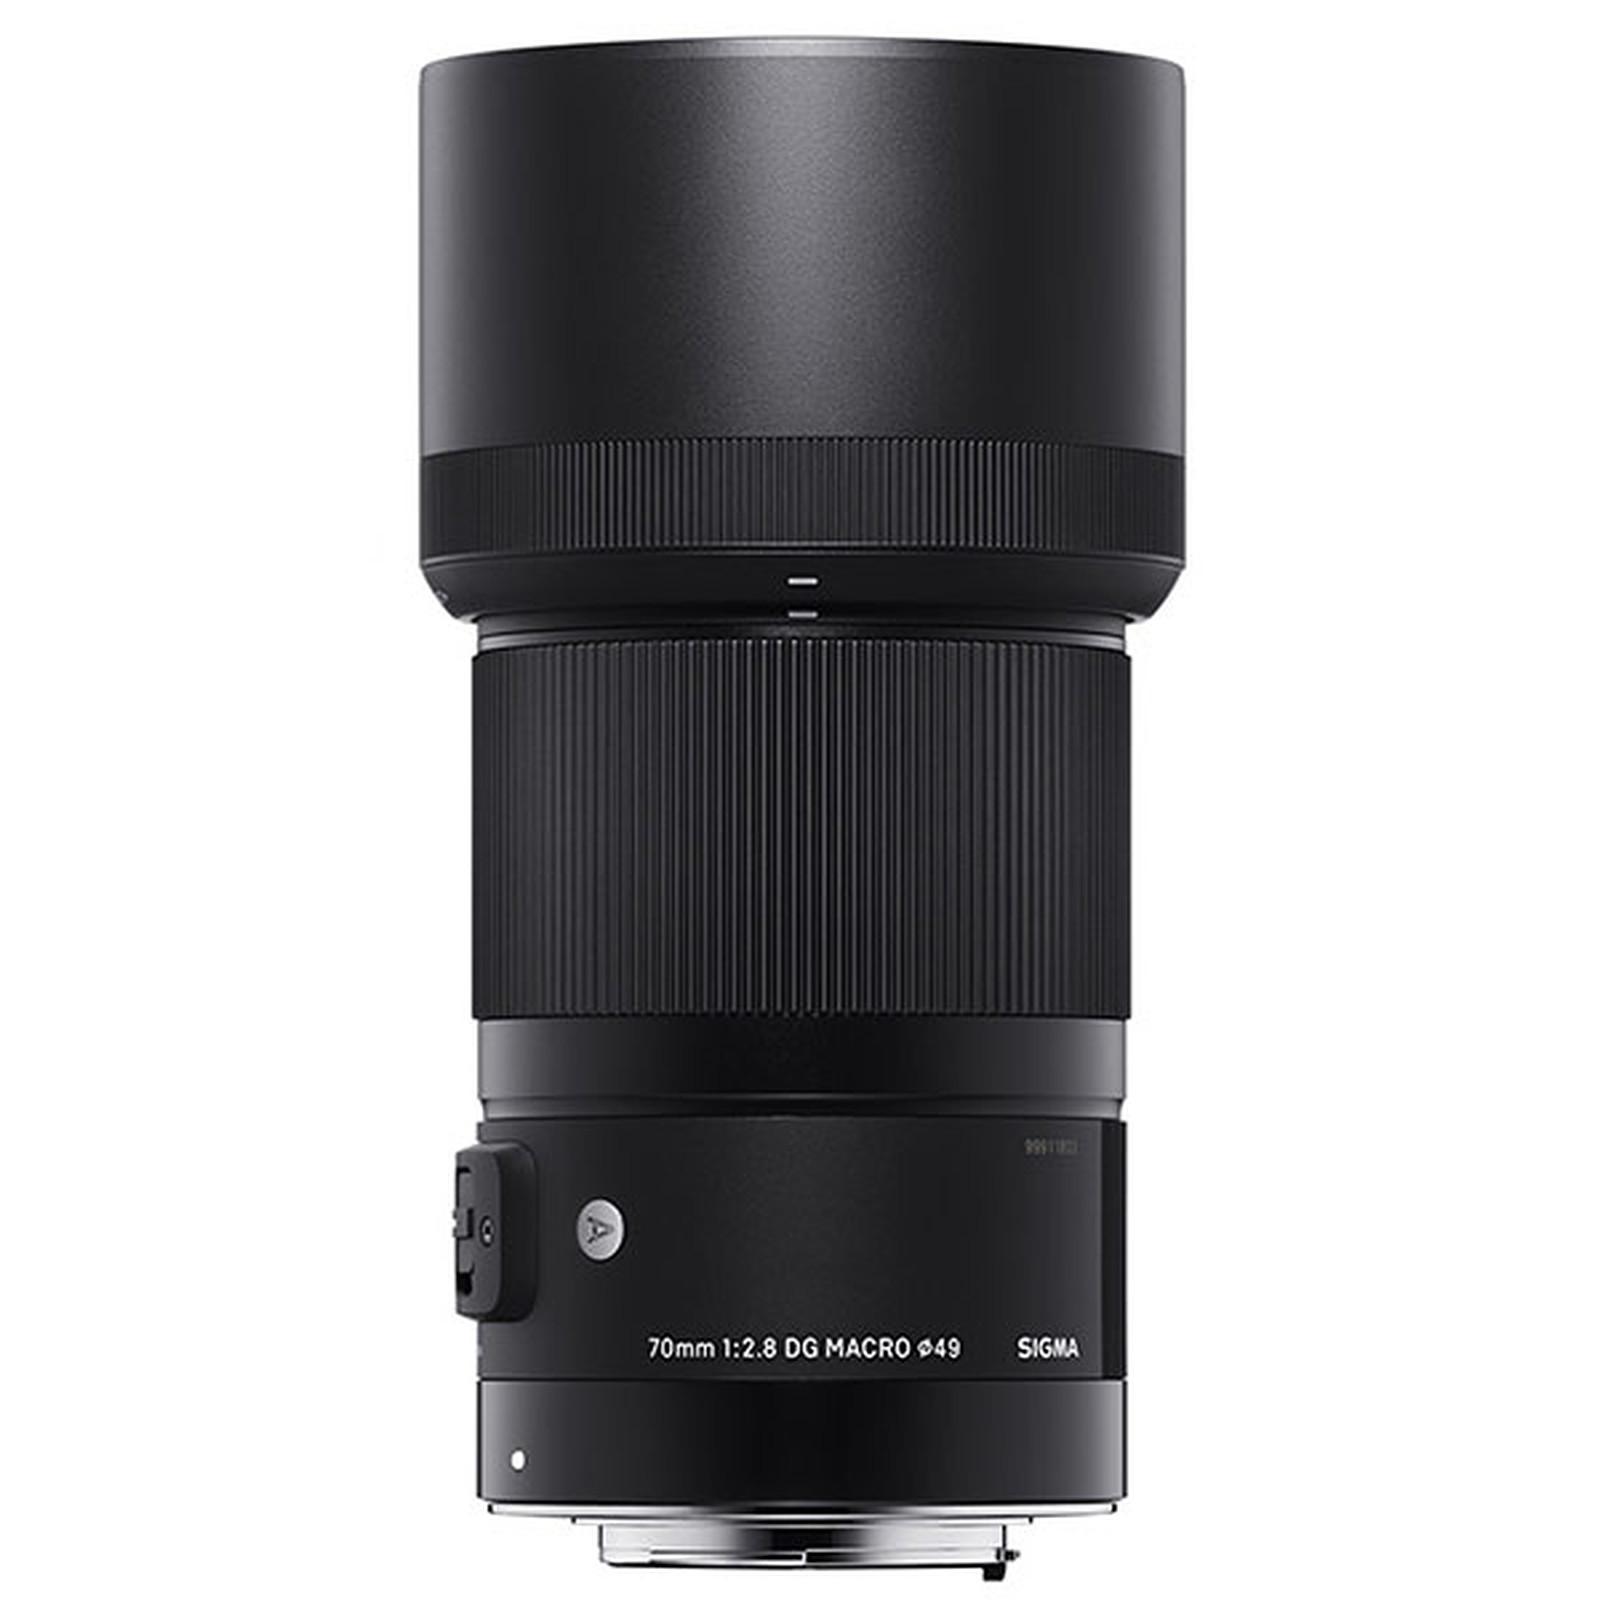 SIGMA 70mm f/2.8 DG Macro Art monture Sony E